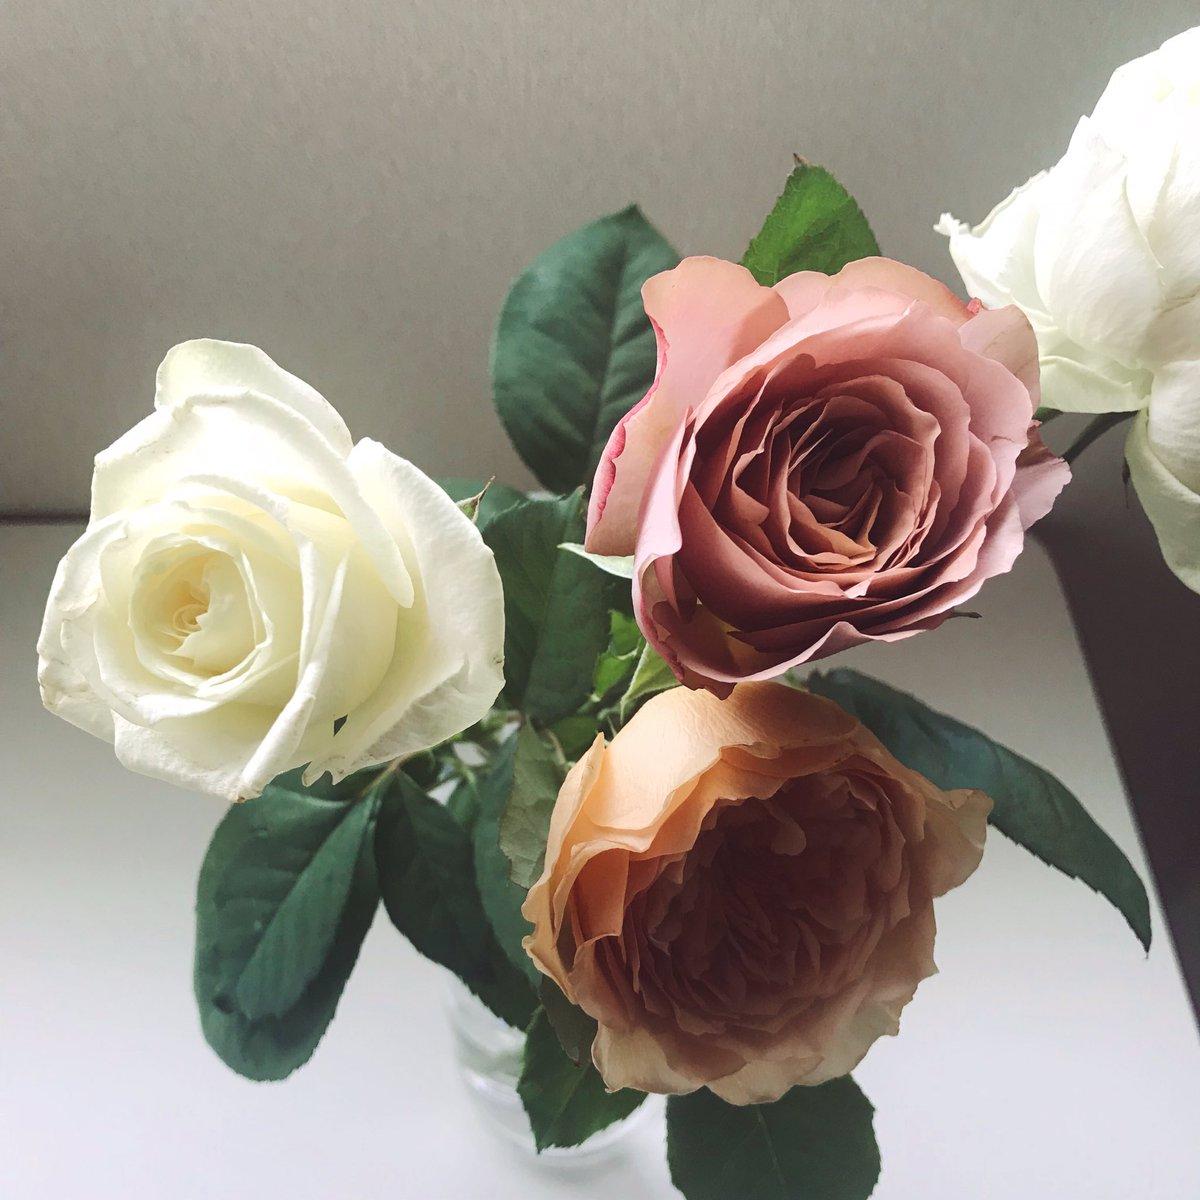 "mariekko on Twitter: ""四月五月に堂々と咲く、女王みたいな真紅の薔薇 ..."